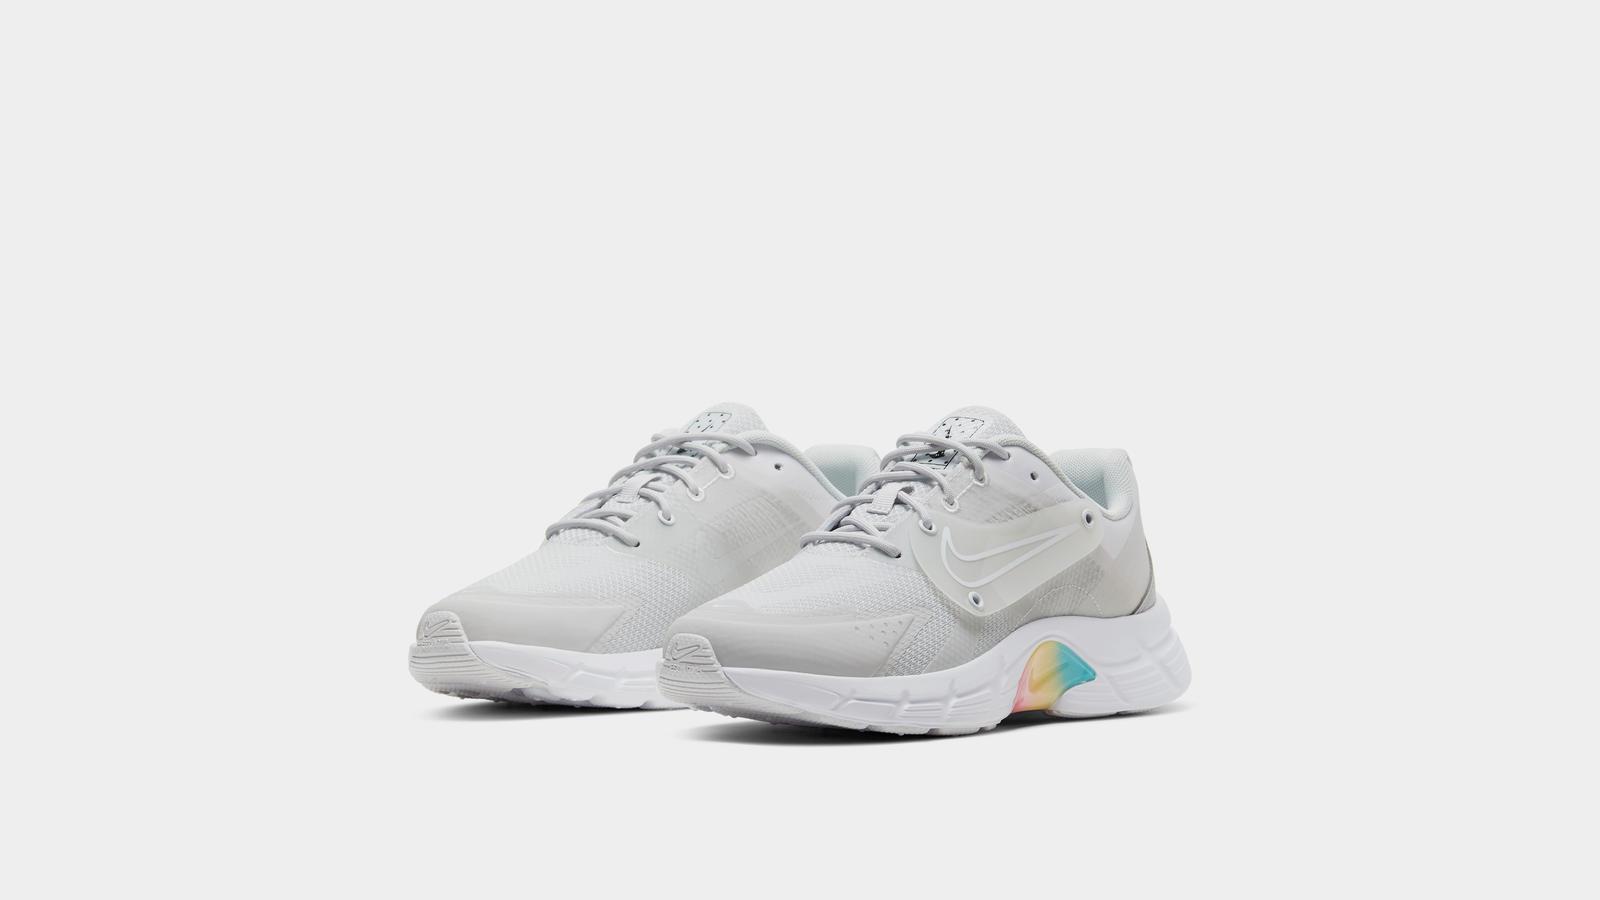 Nike Alphina 5000 6